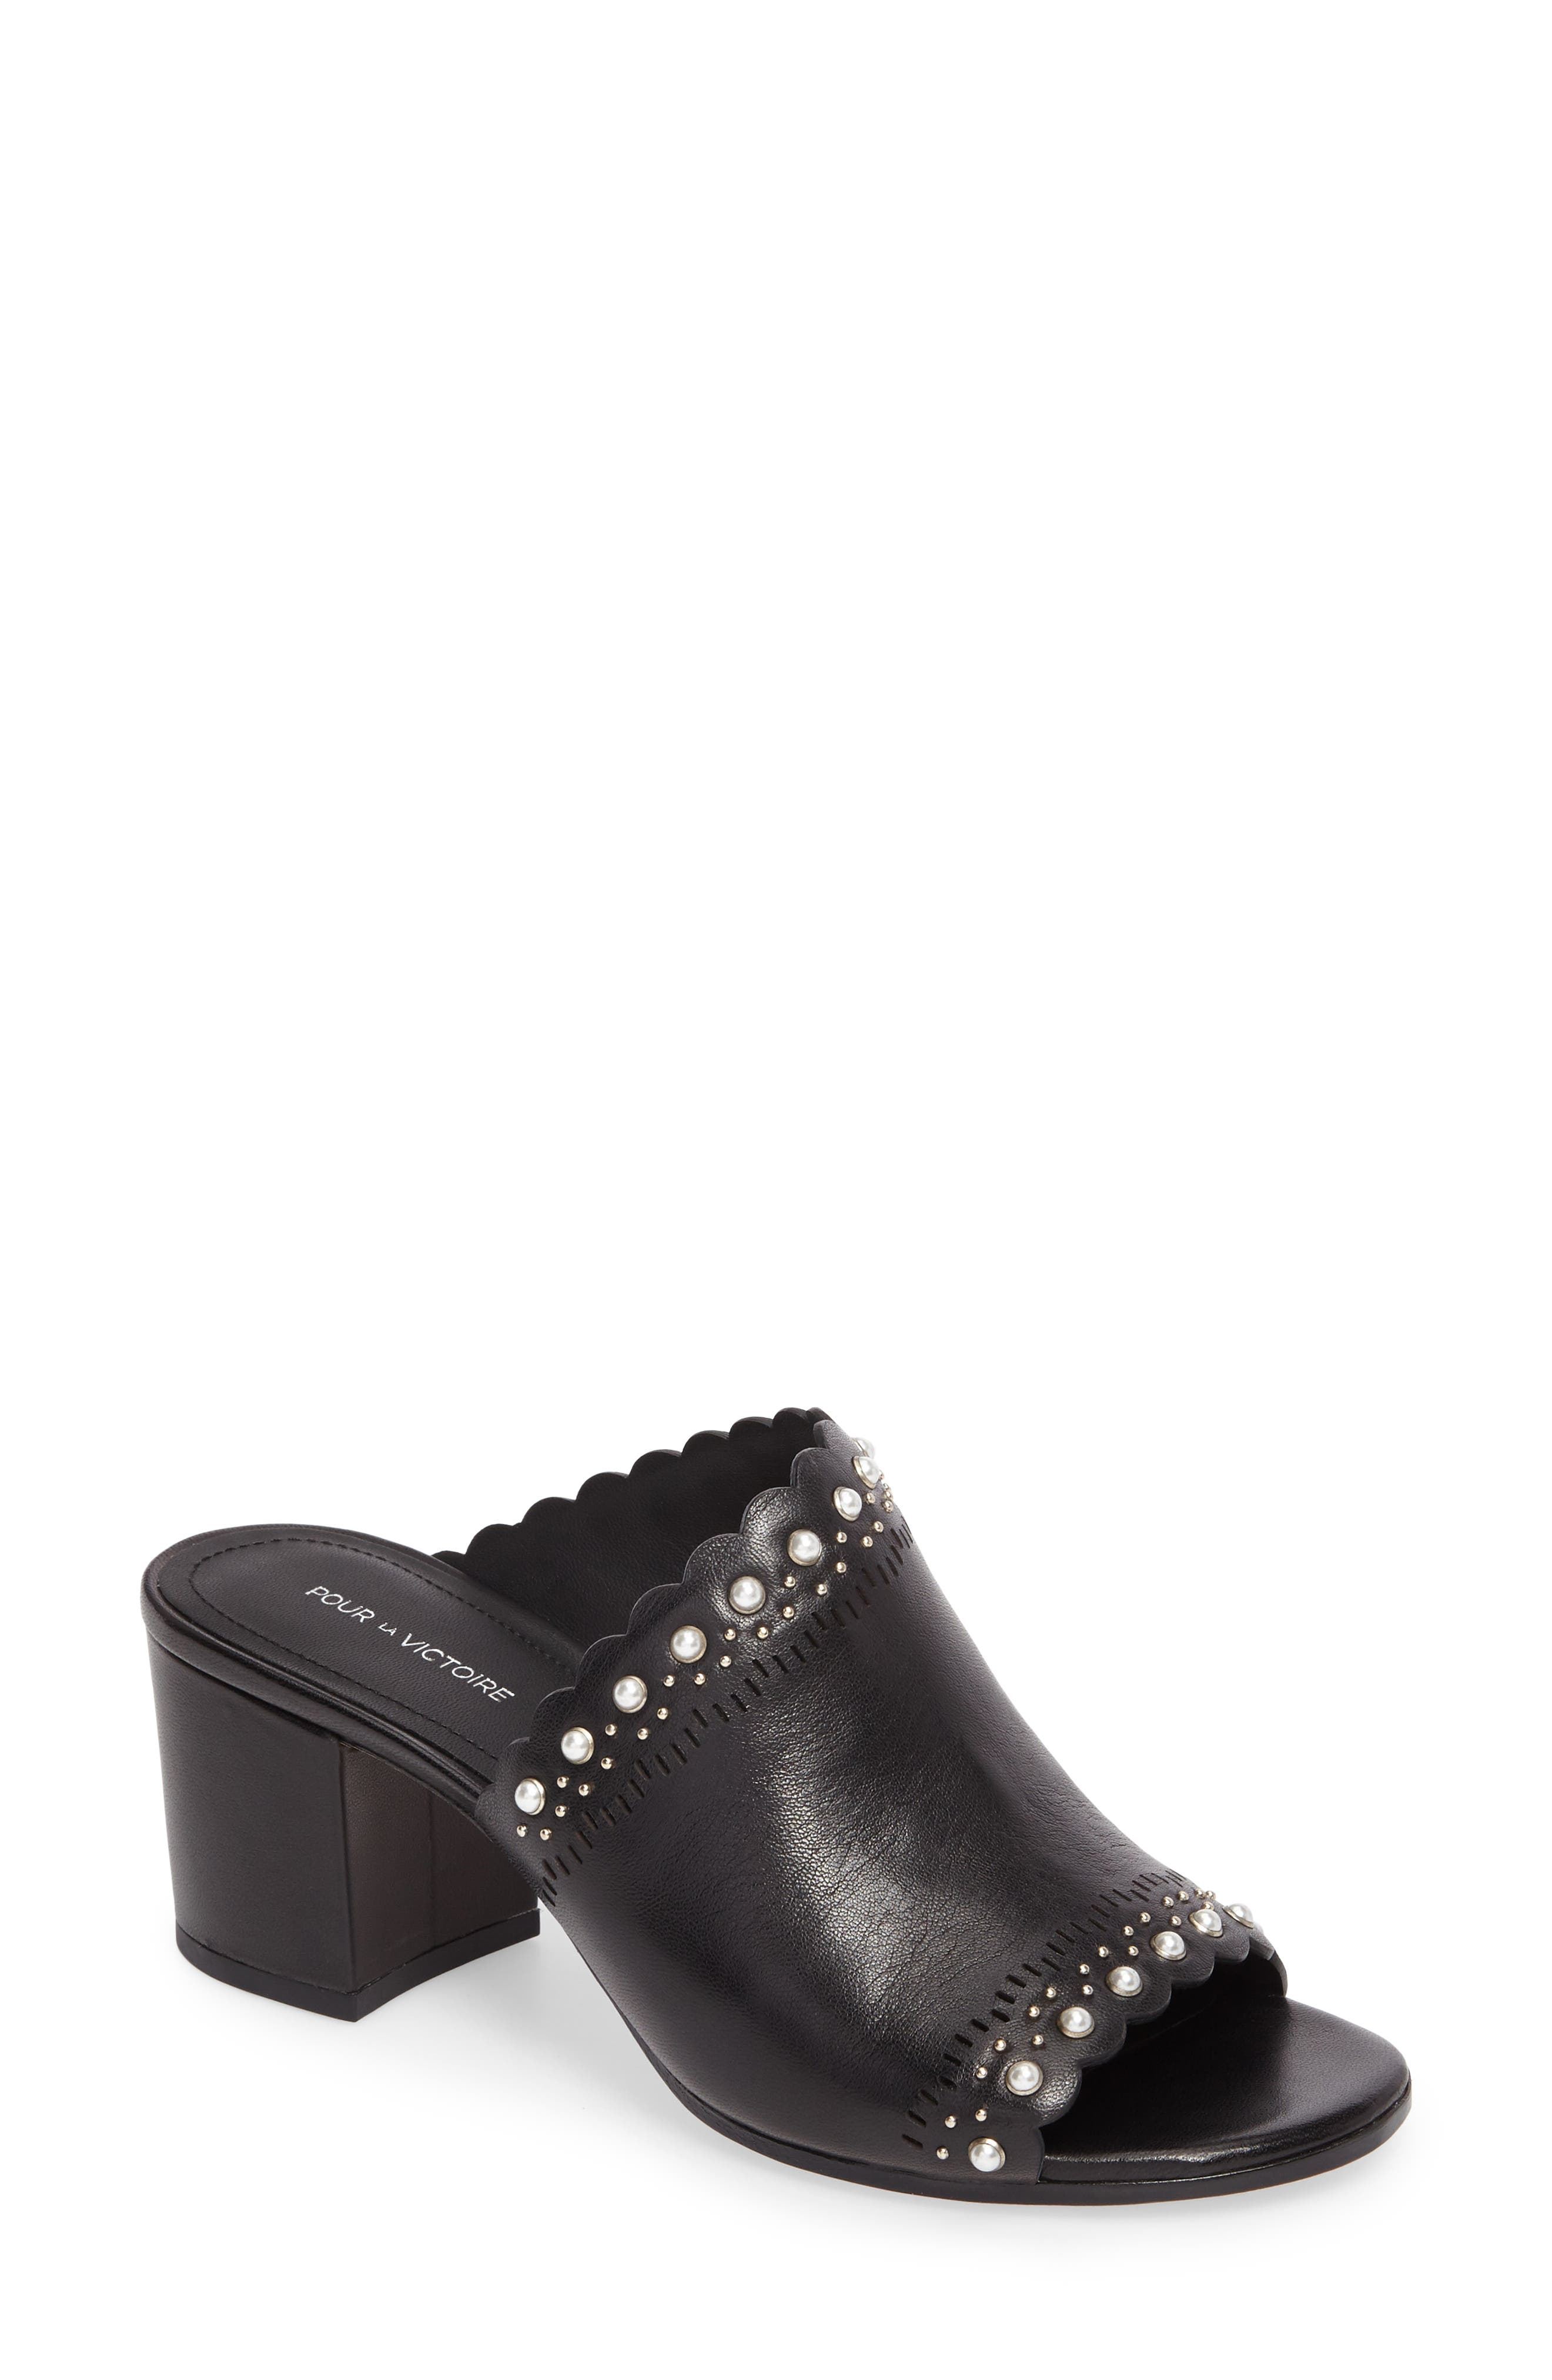 cf55ccd48bc84 Pour La Victoire Women S Amela Embellished Leather Block Heel Slide Sandals  In Black